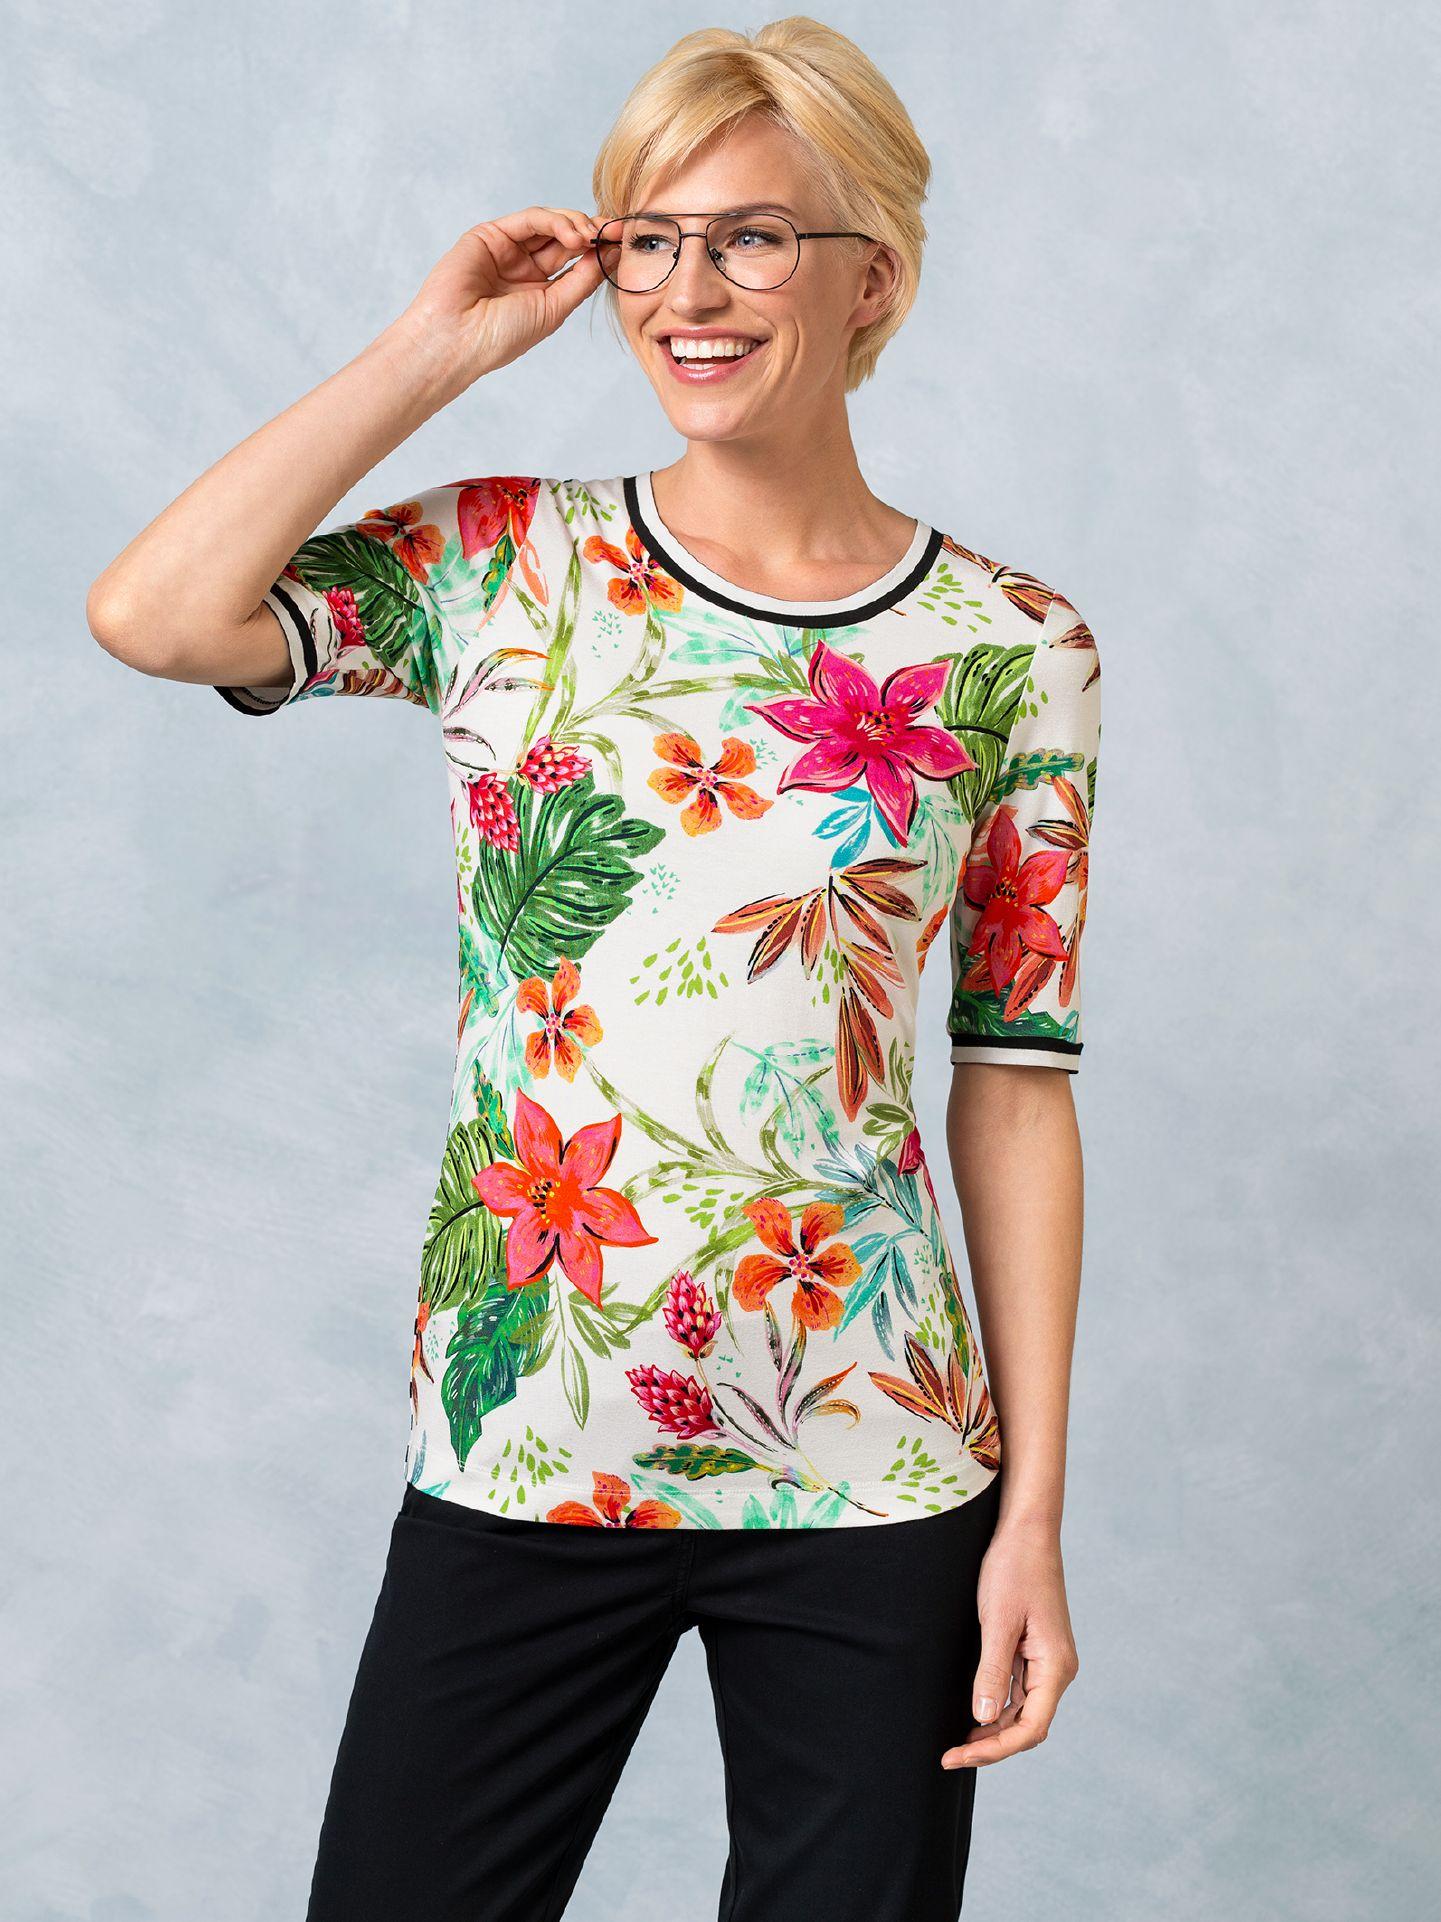 Walbusch Damen Shirt Costa Rica in normalen Größen gemustert Weiß gemustert 36, 38, 40, 42, 44, 46, 48/50, 52/54